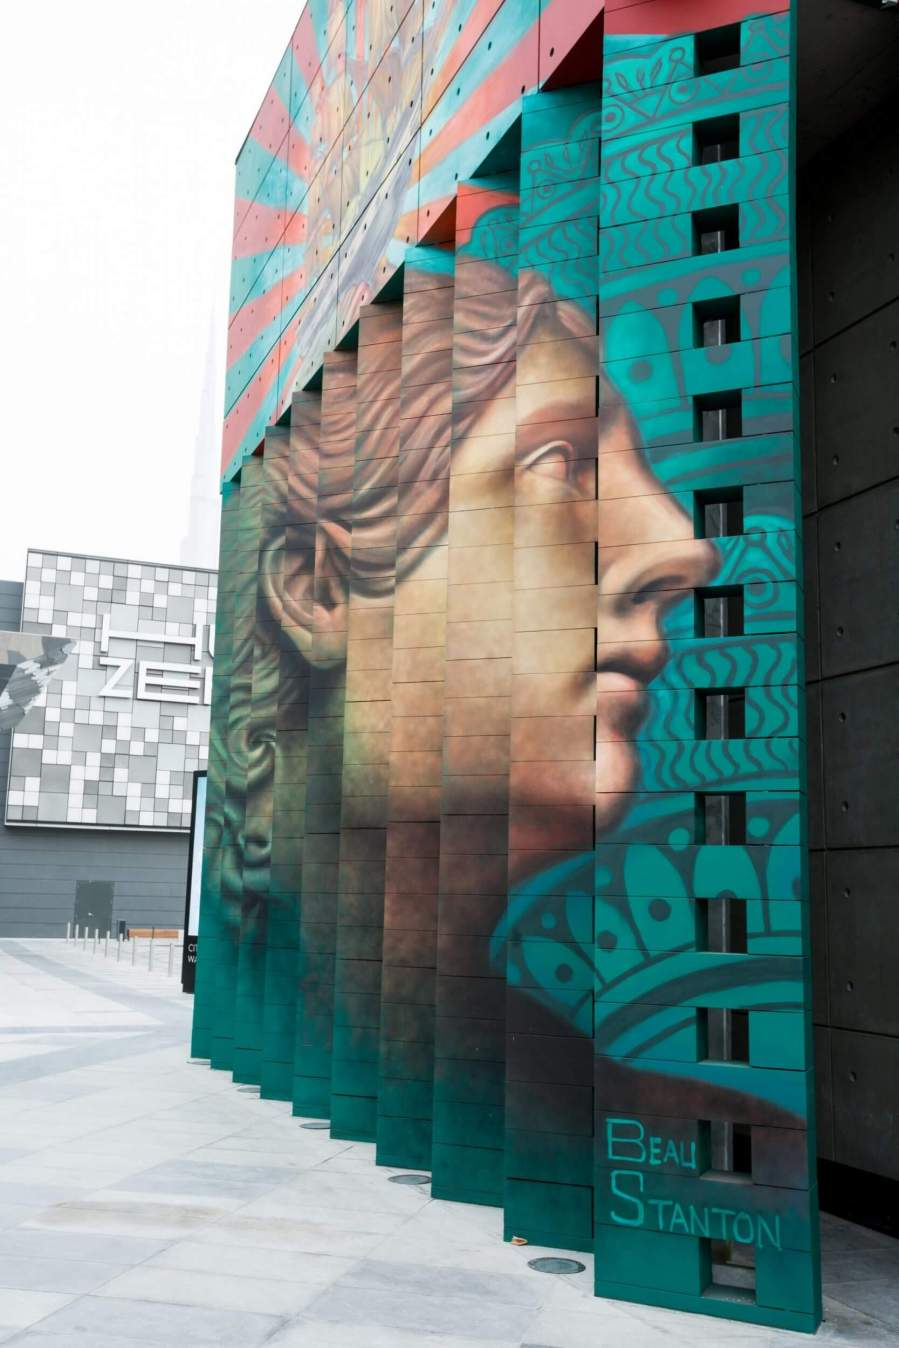 Graffiti wall uae - Beau Stanton Dubai Walls Street Art Festival